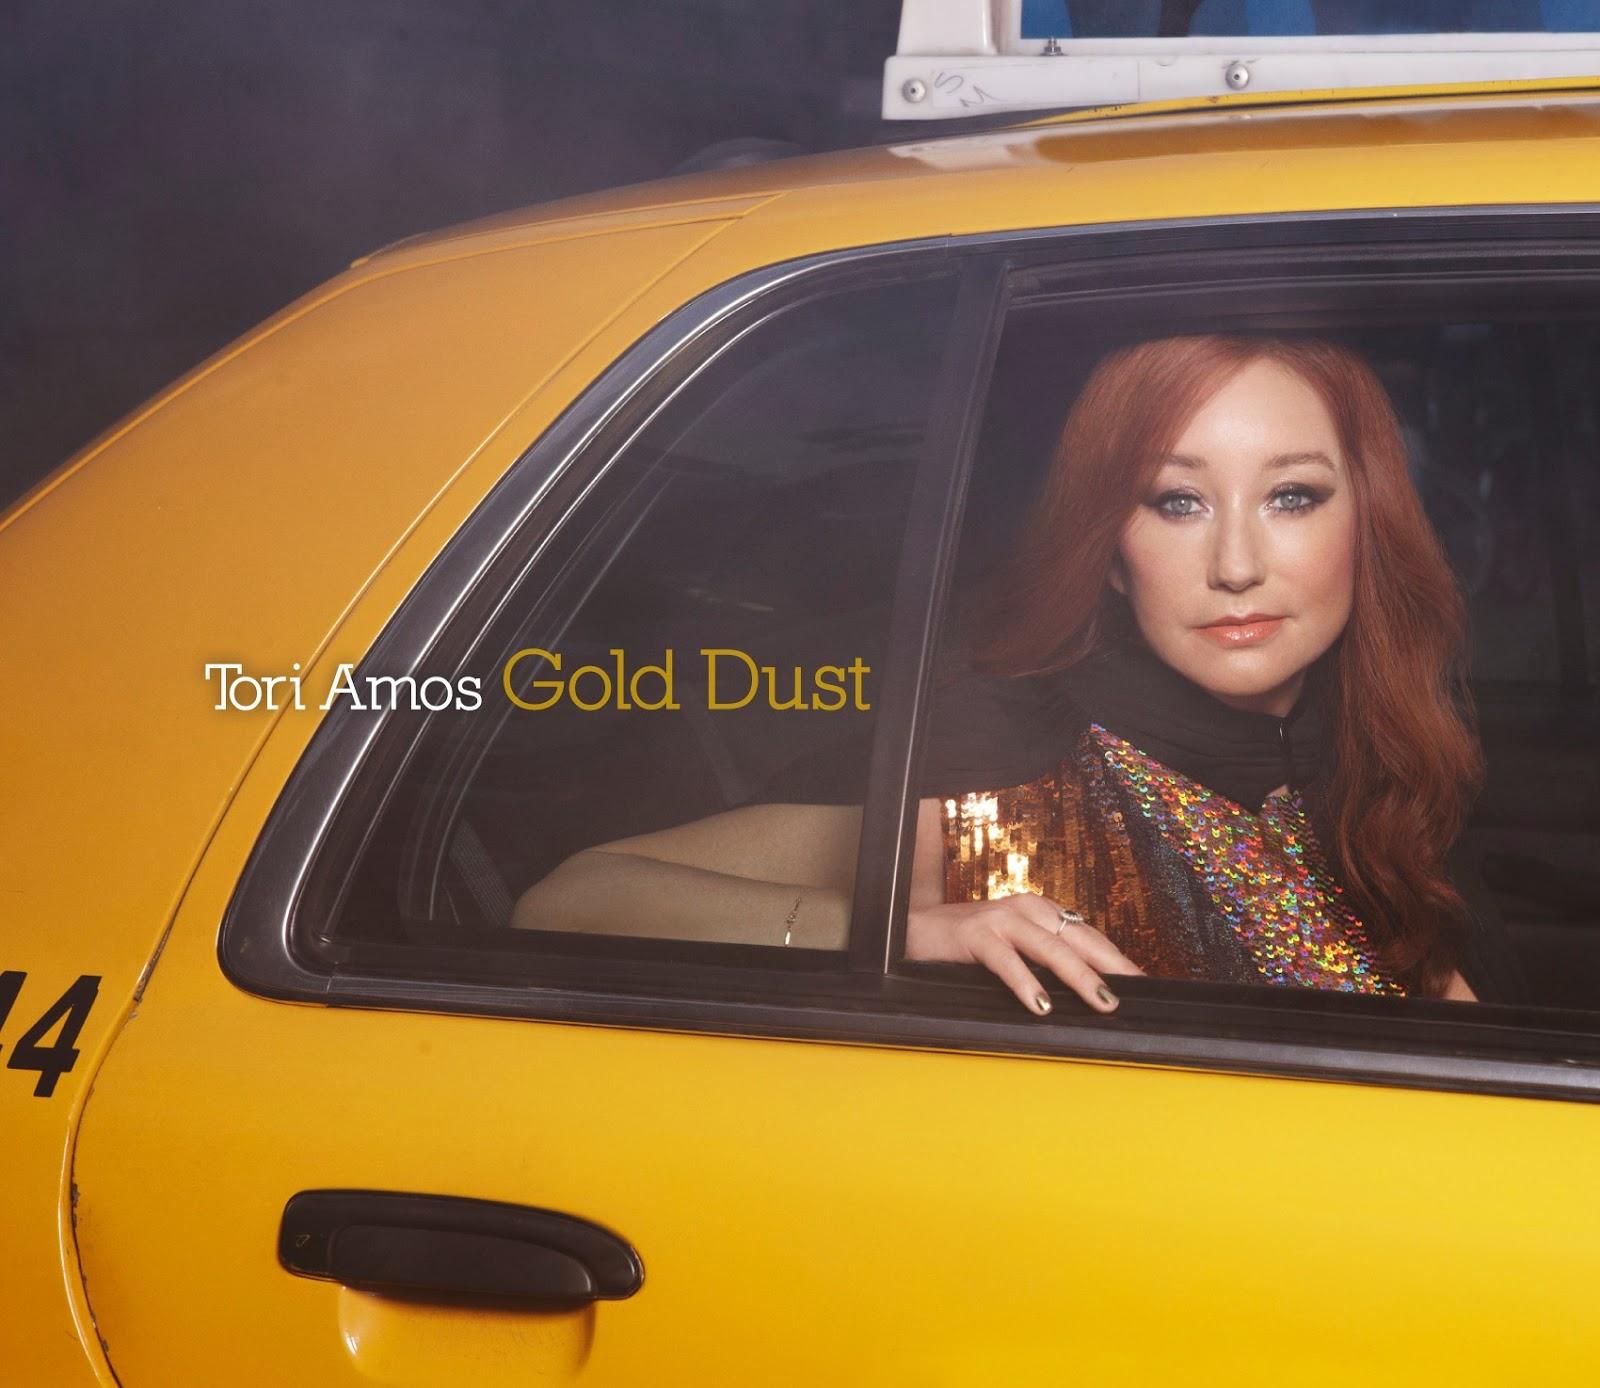 http://2.bp.blogspot.com/-TnIJBn2DjYE/UKvrBW3kVYI/AAAAAAAADUw/U9OdCIK3yHw/s1600/Tori_Amos_Gold_Dust.jpeg